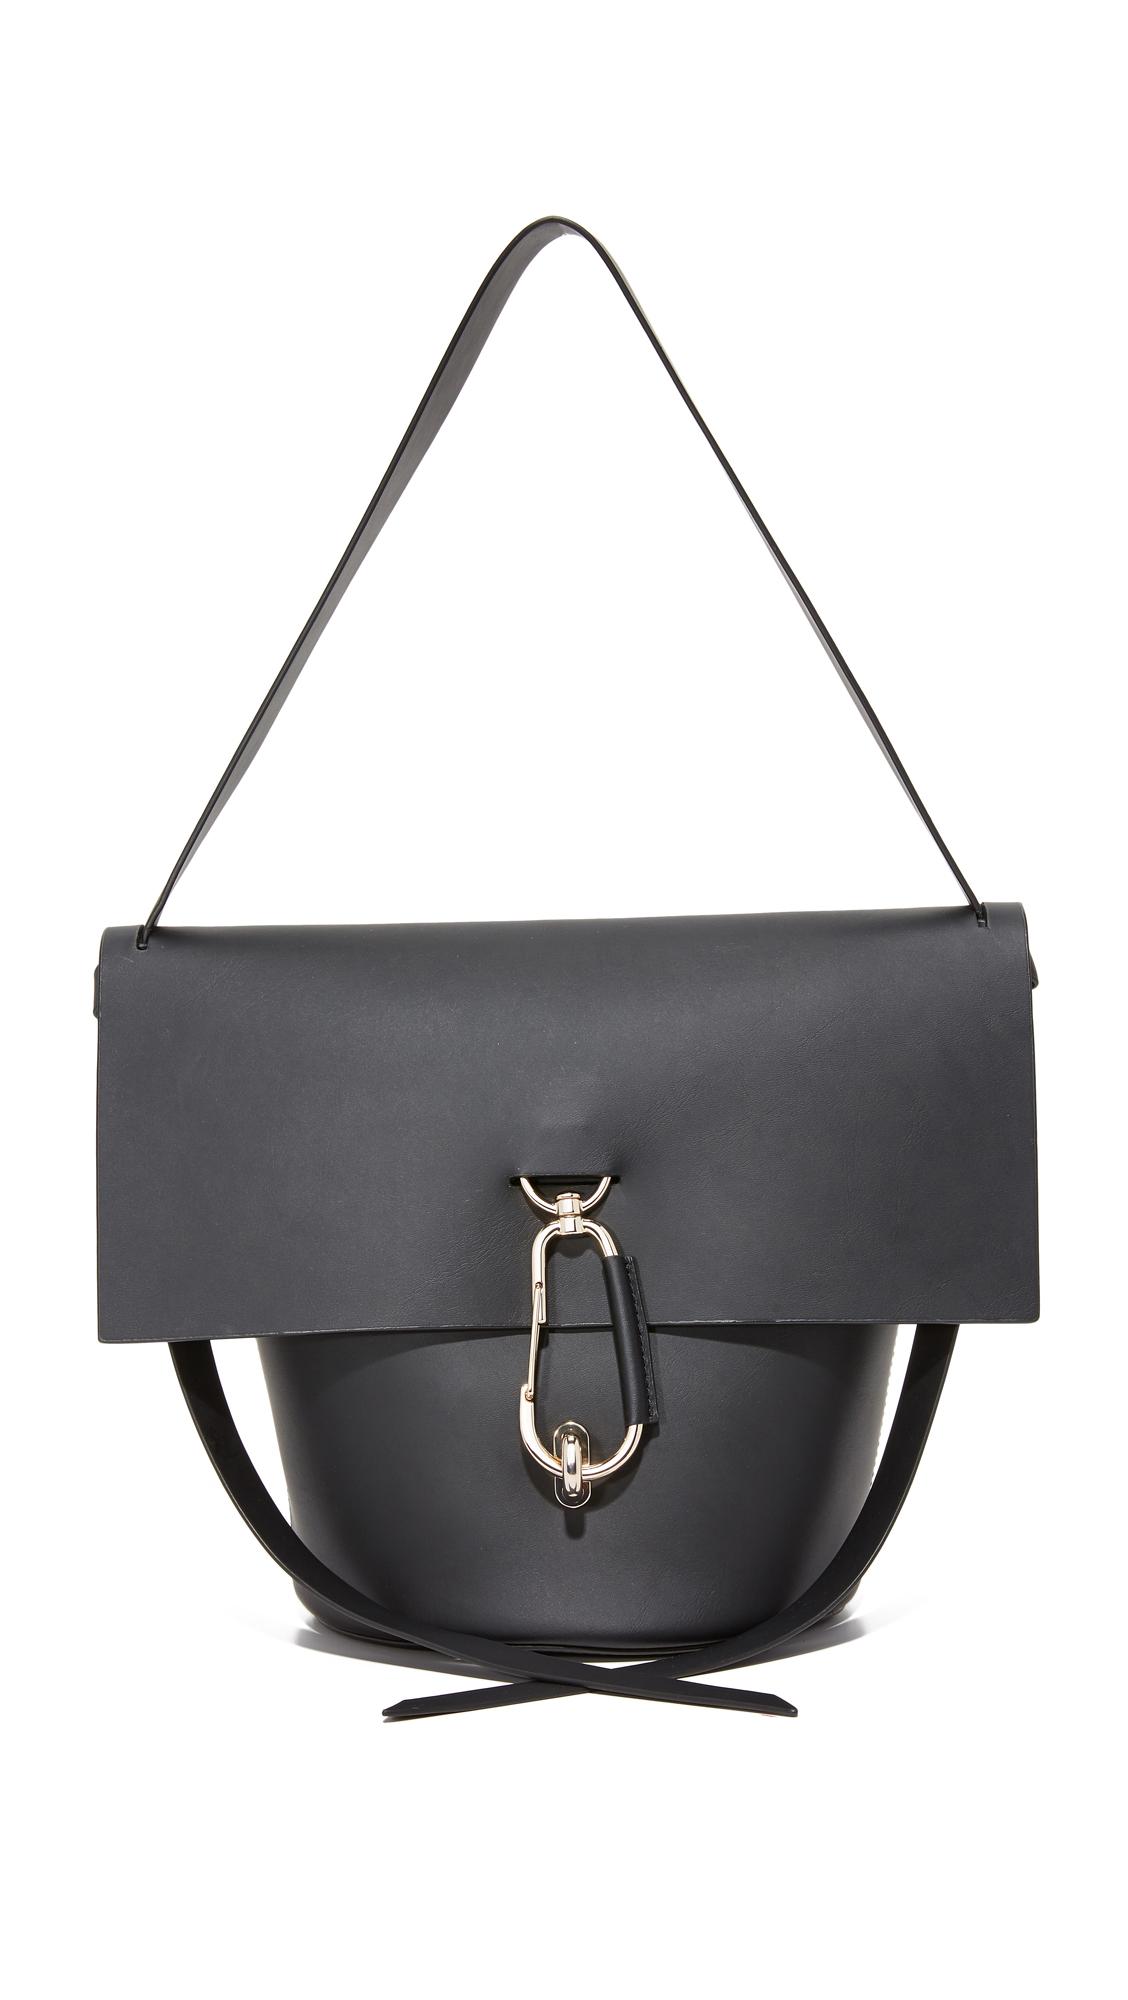 ZAC Zac Posen Belay Shoulder Bag - Black